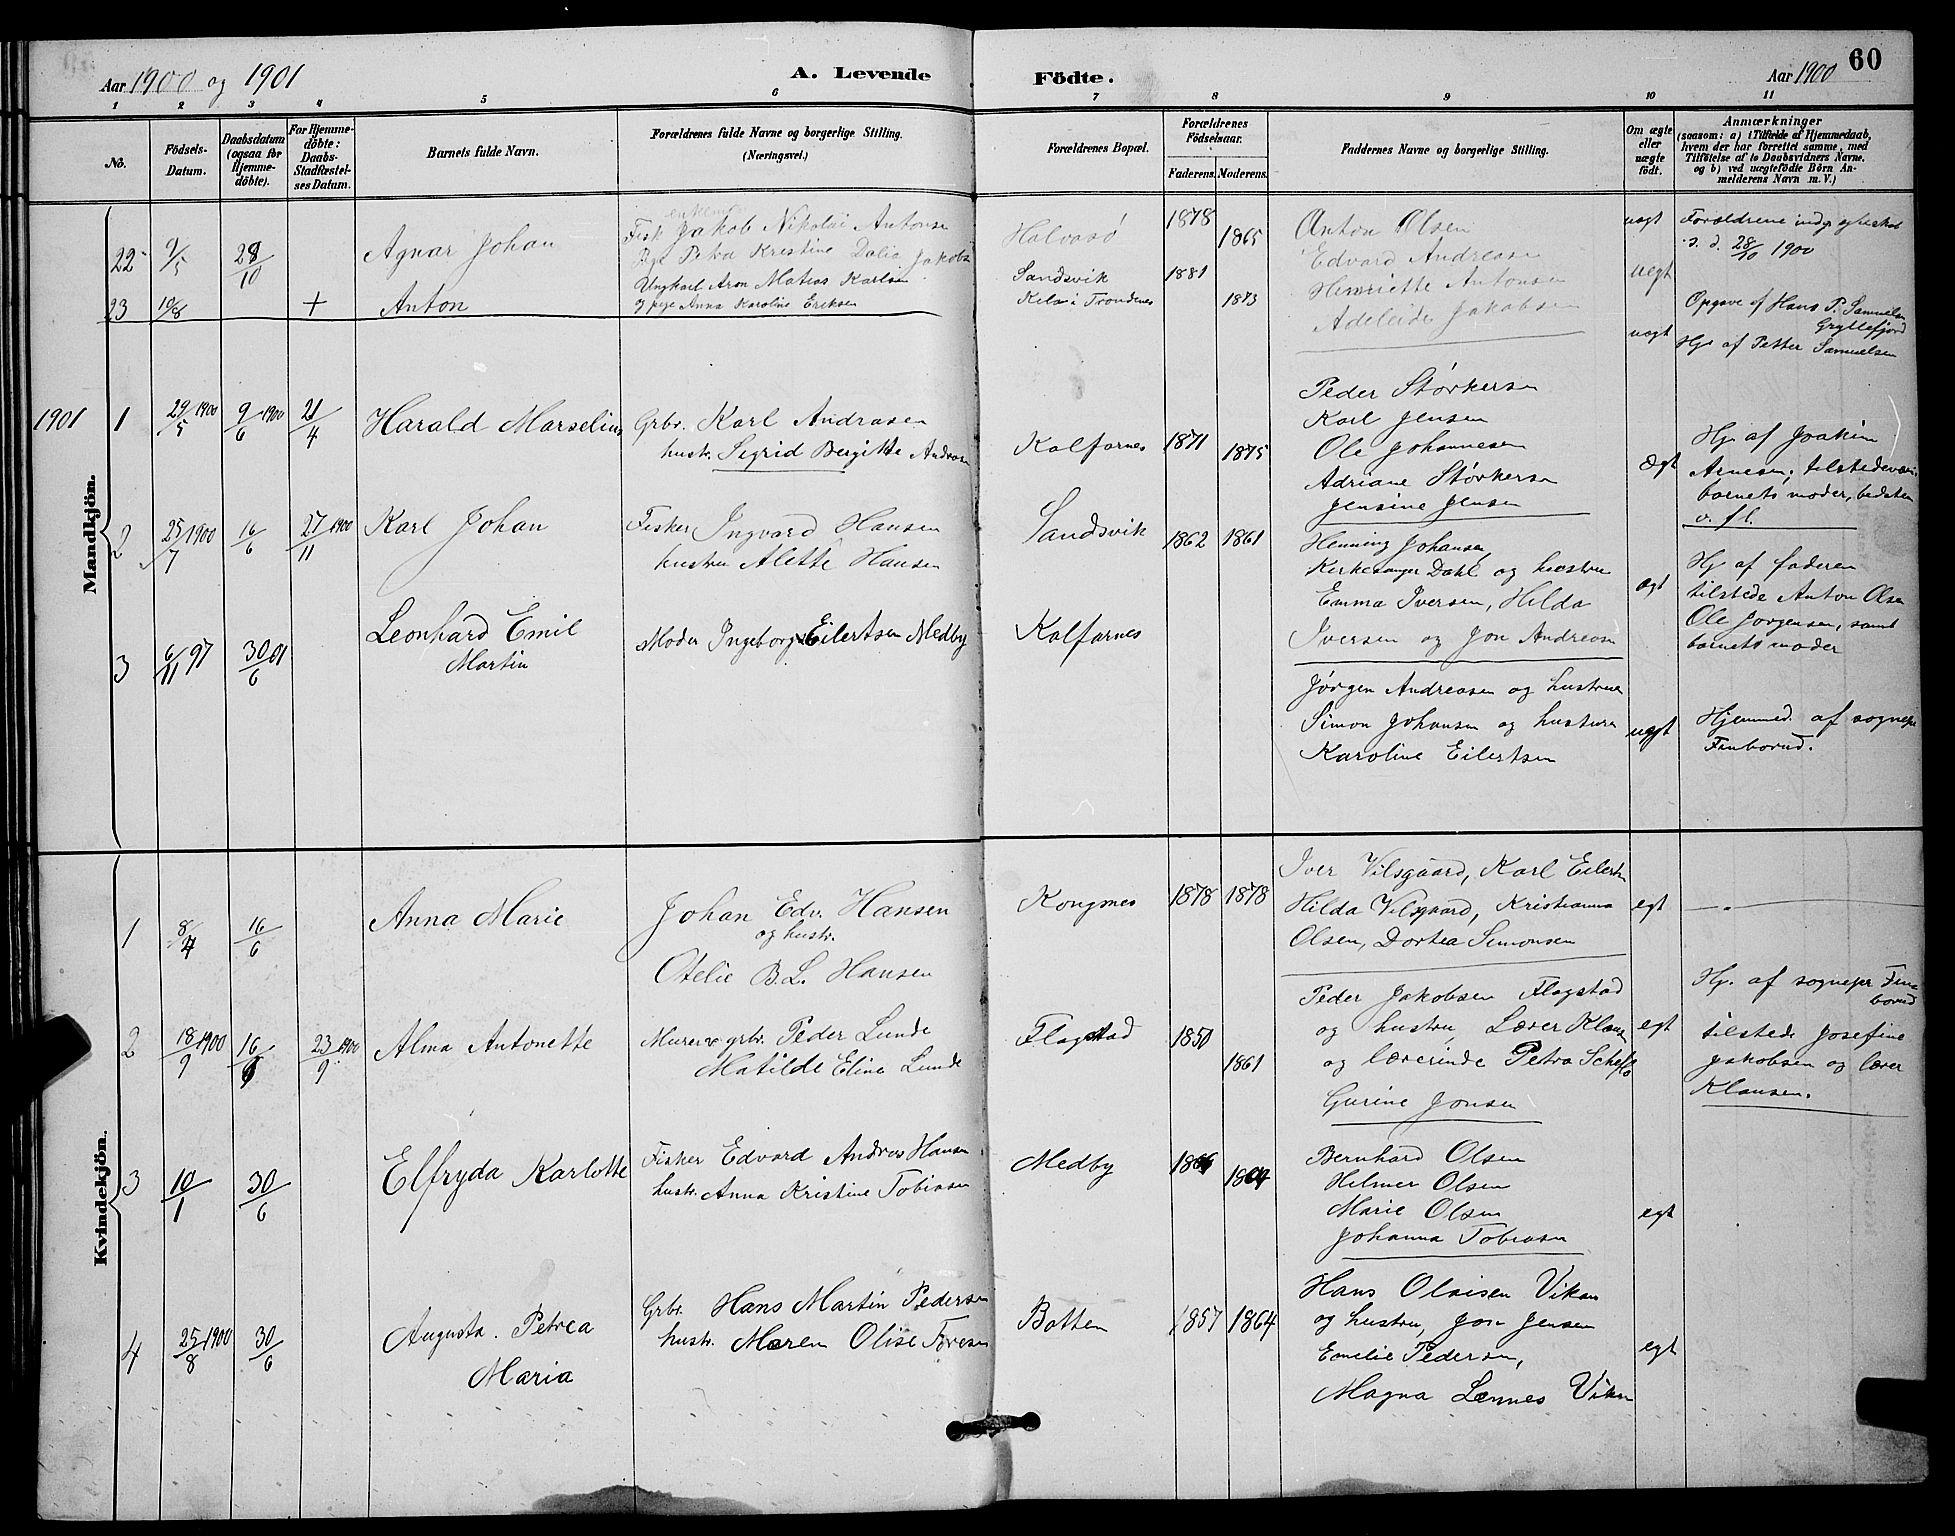 SATØ, Mefjord/Berg sokneprestkontor, G/Ga/Gab/L0012klokker: Klokkerbok nr. 12, 1887-1902, s. 60